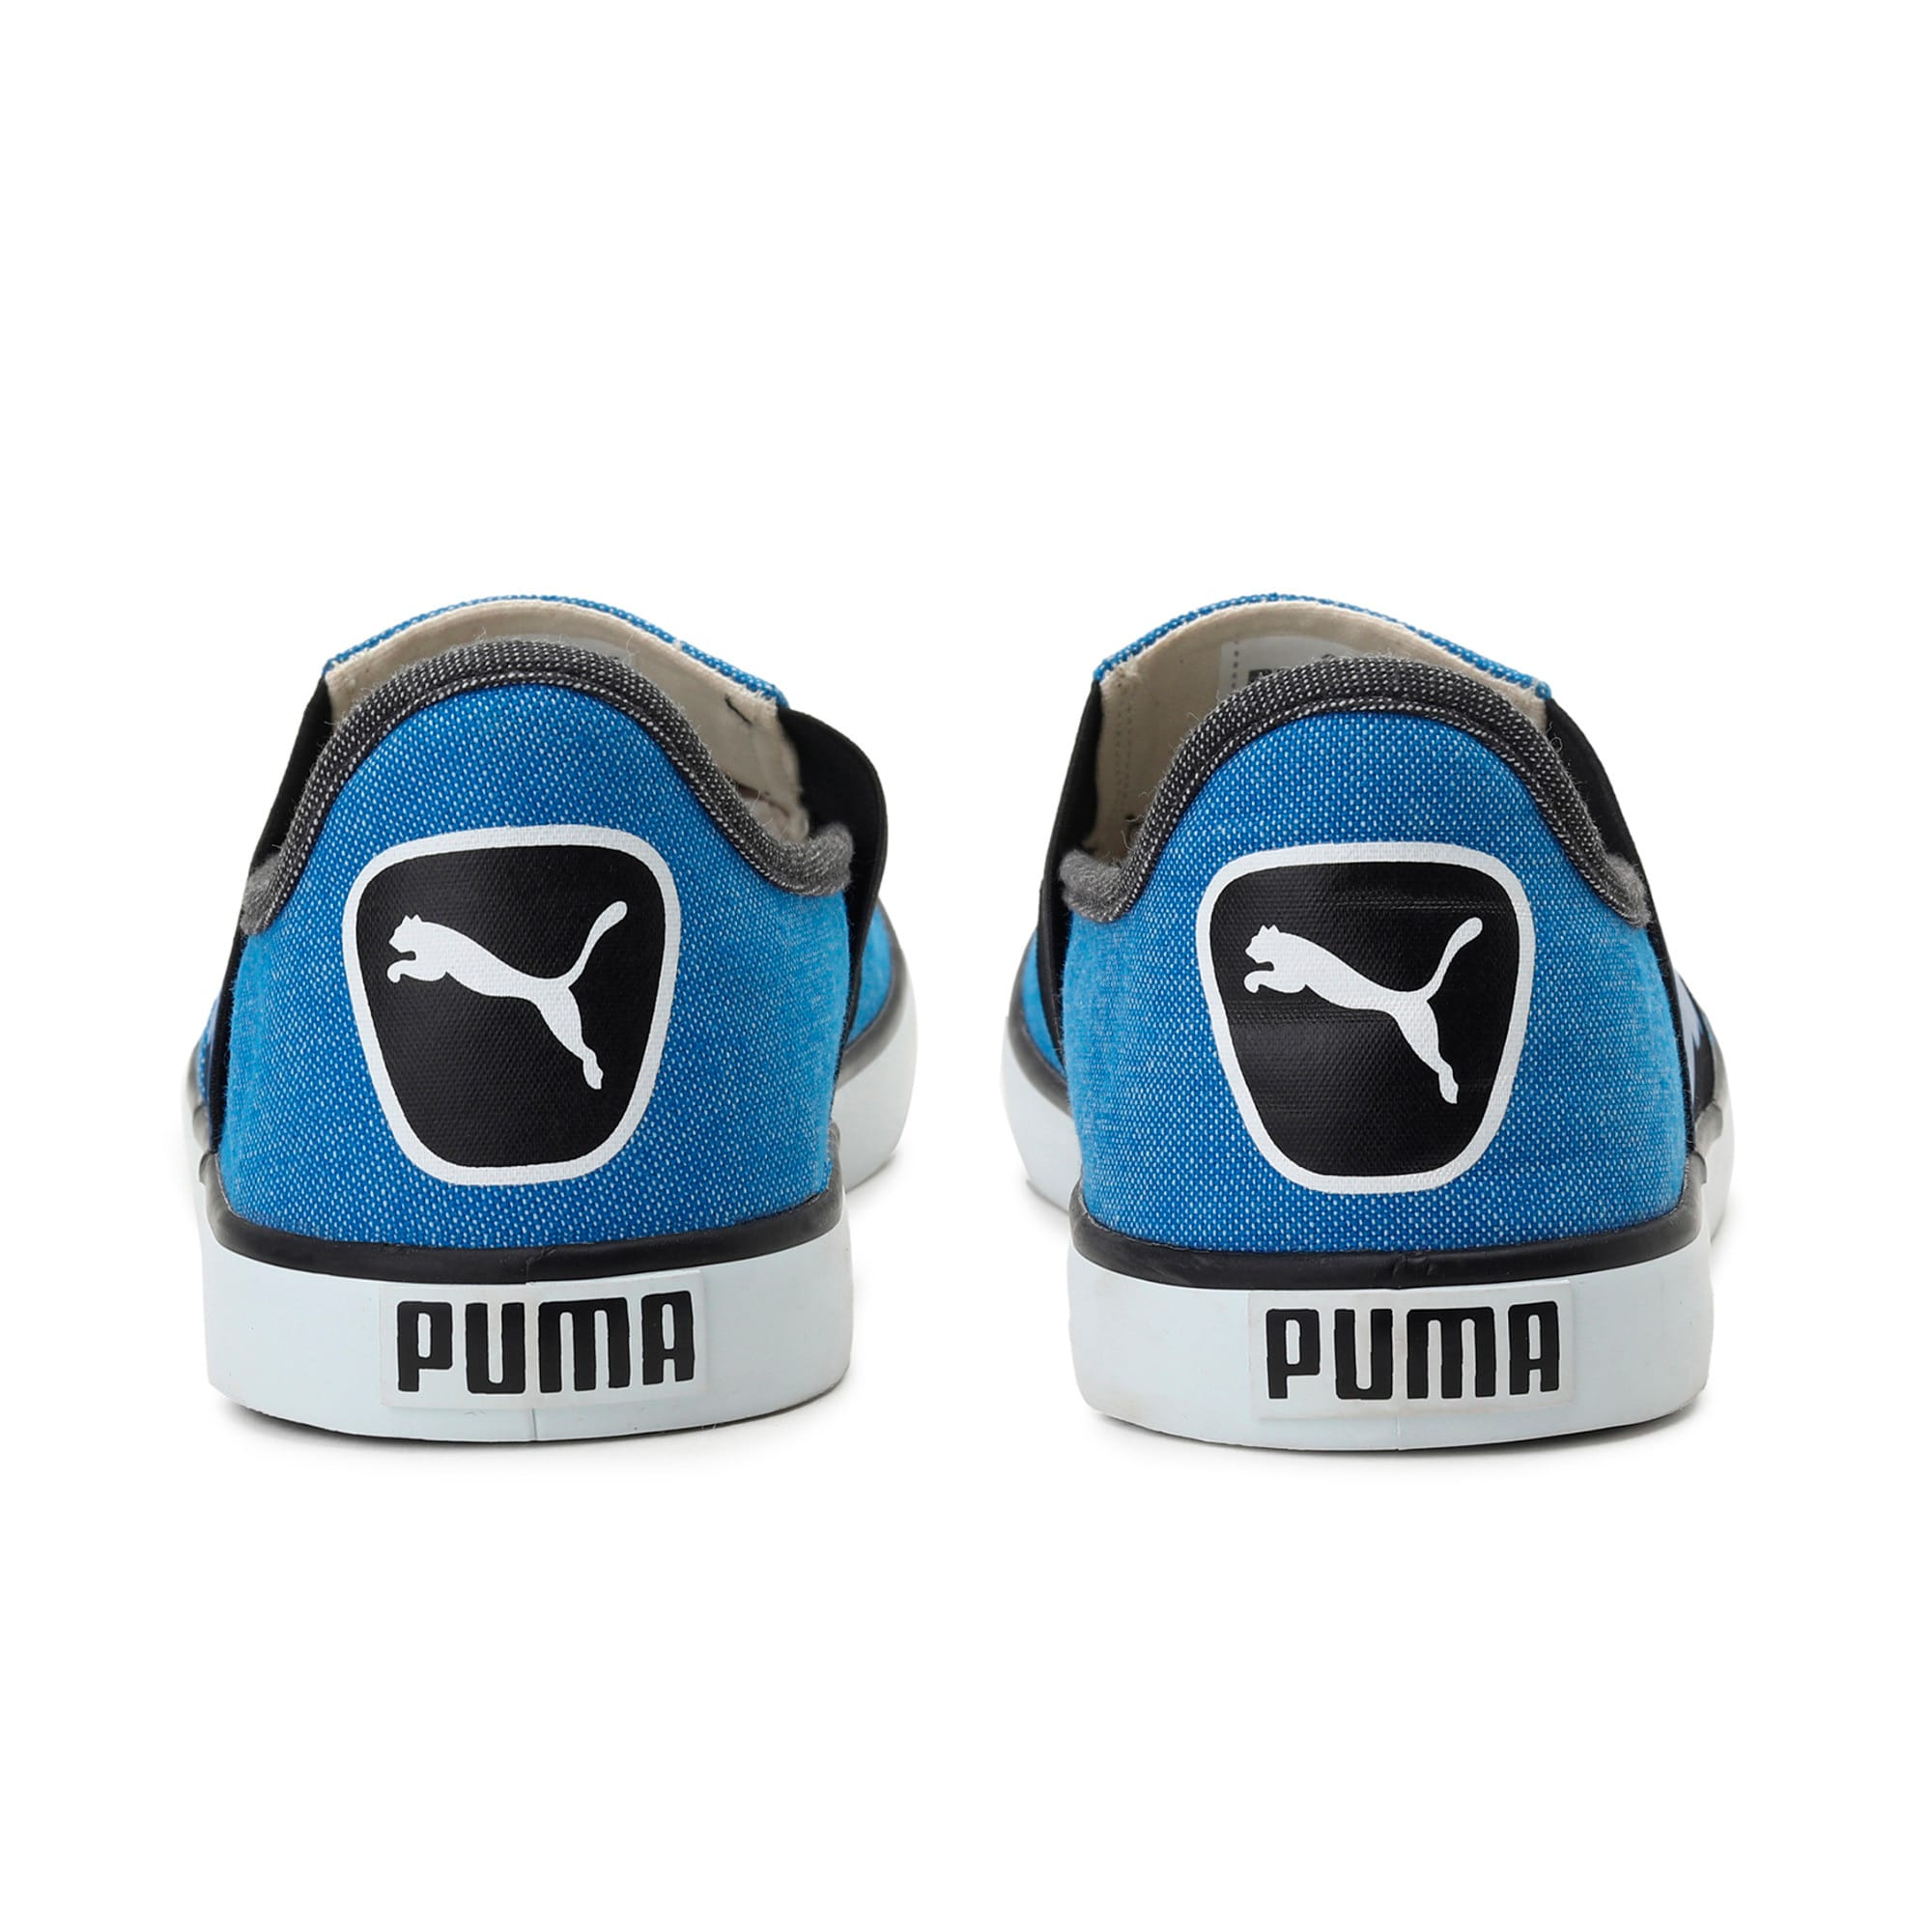 Thumbnail 4 of Lazy Slip On II DP, Royal Blue-Puma Black, medium-IND